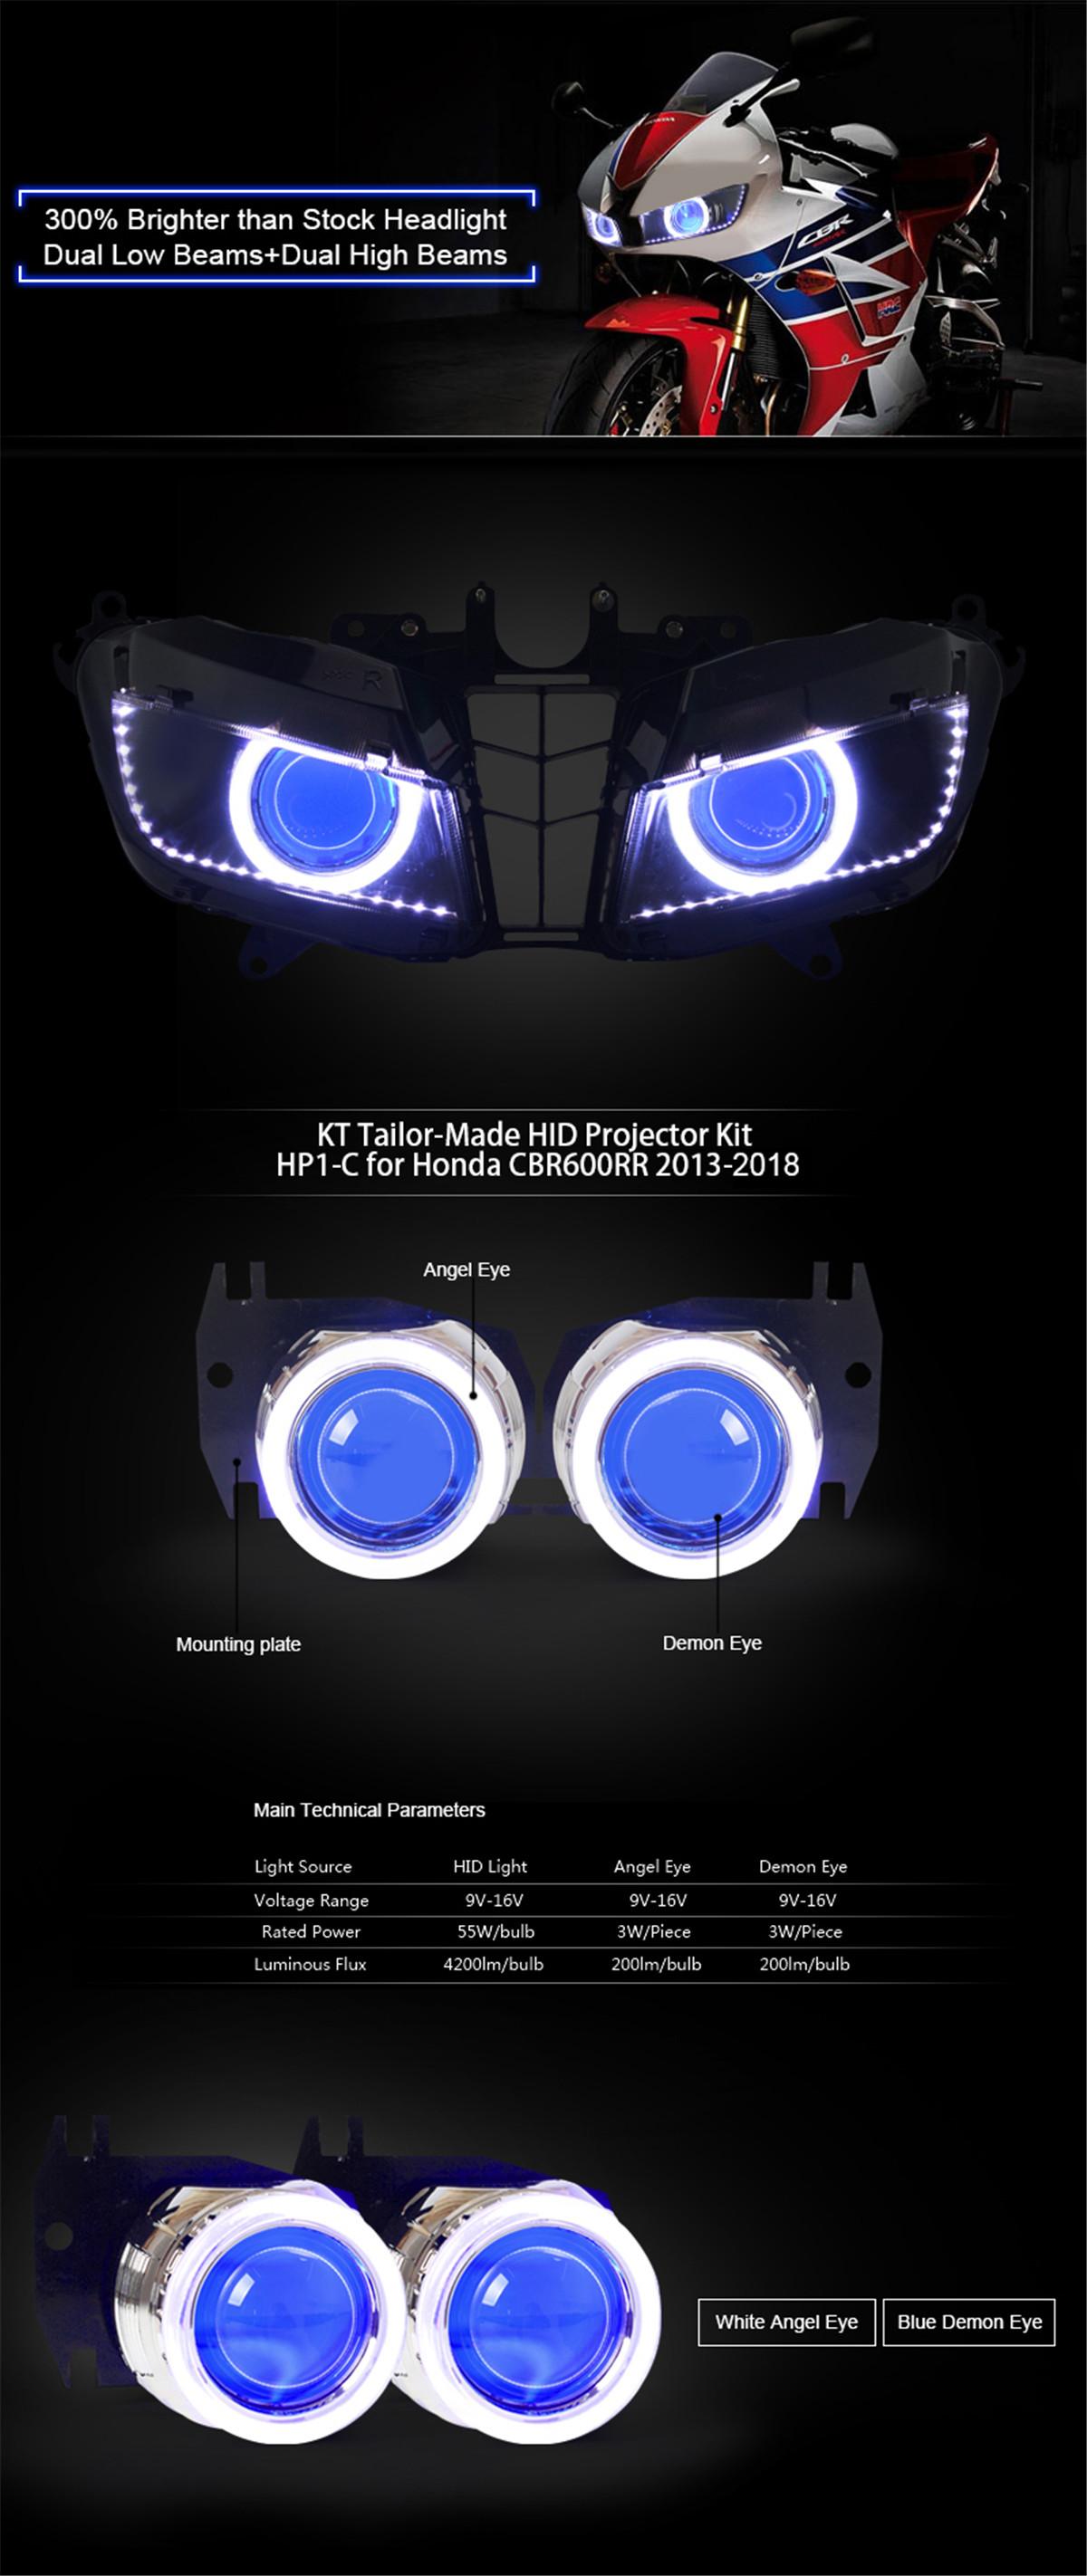 Honda CBR600RR 2013 2014 2015 2016 2017 2018 projector